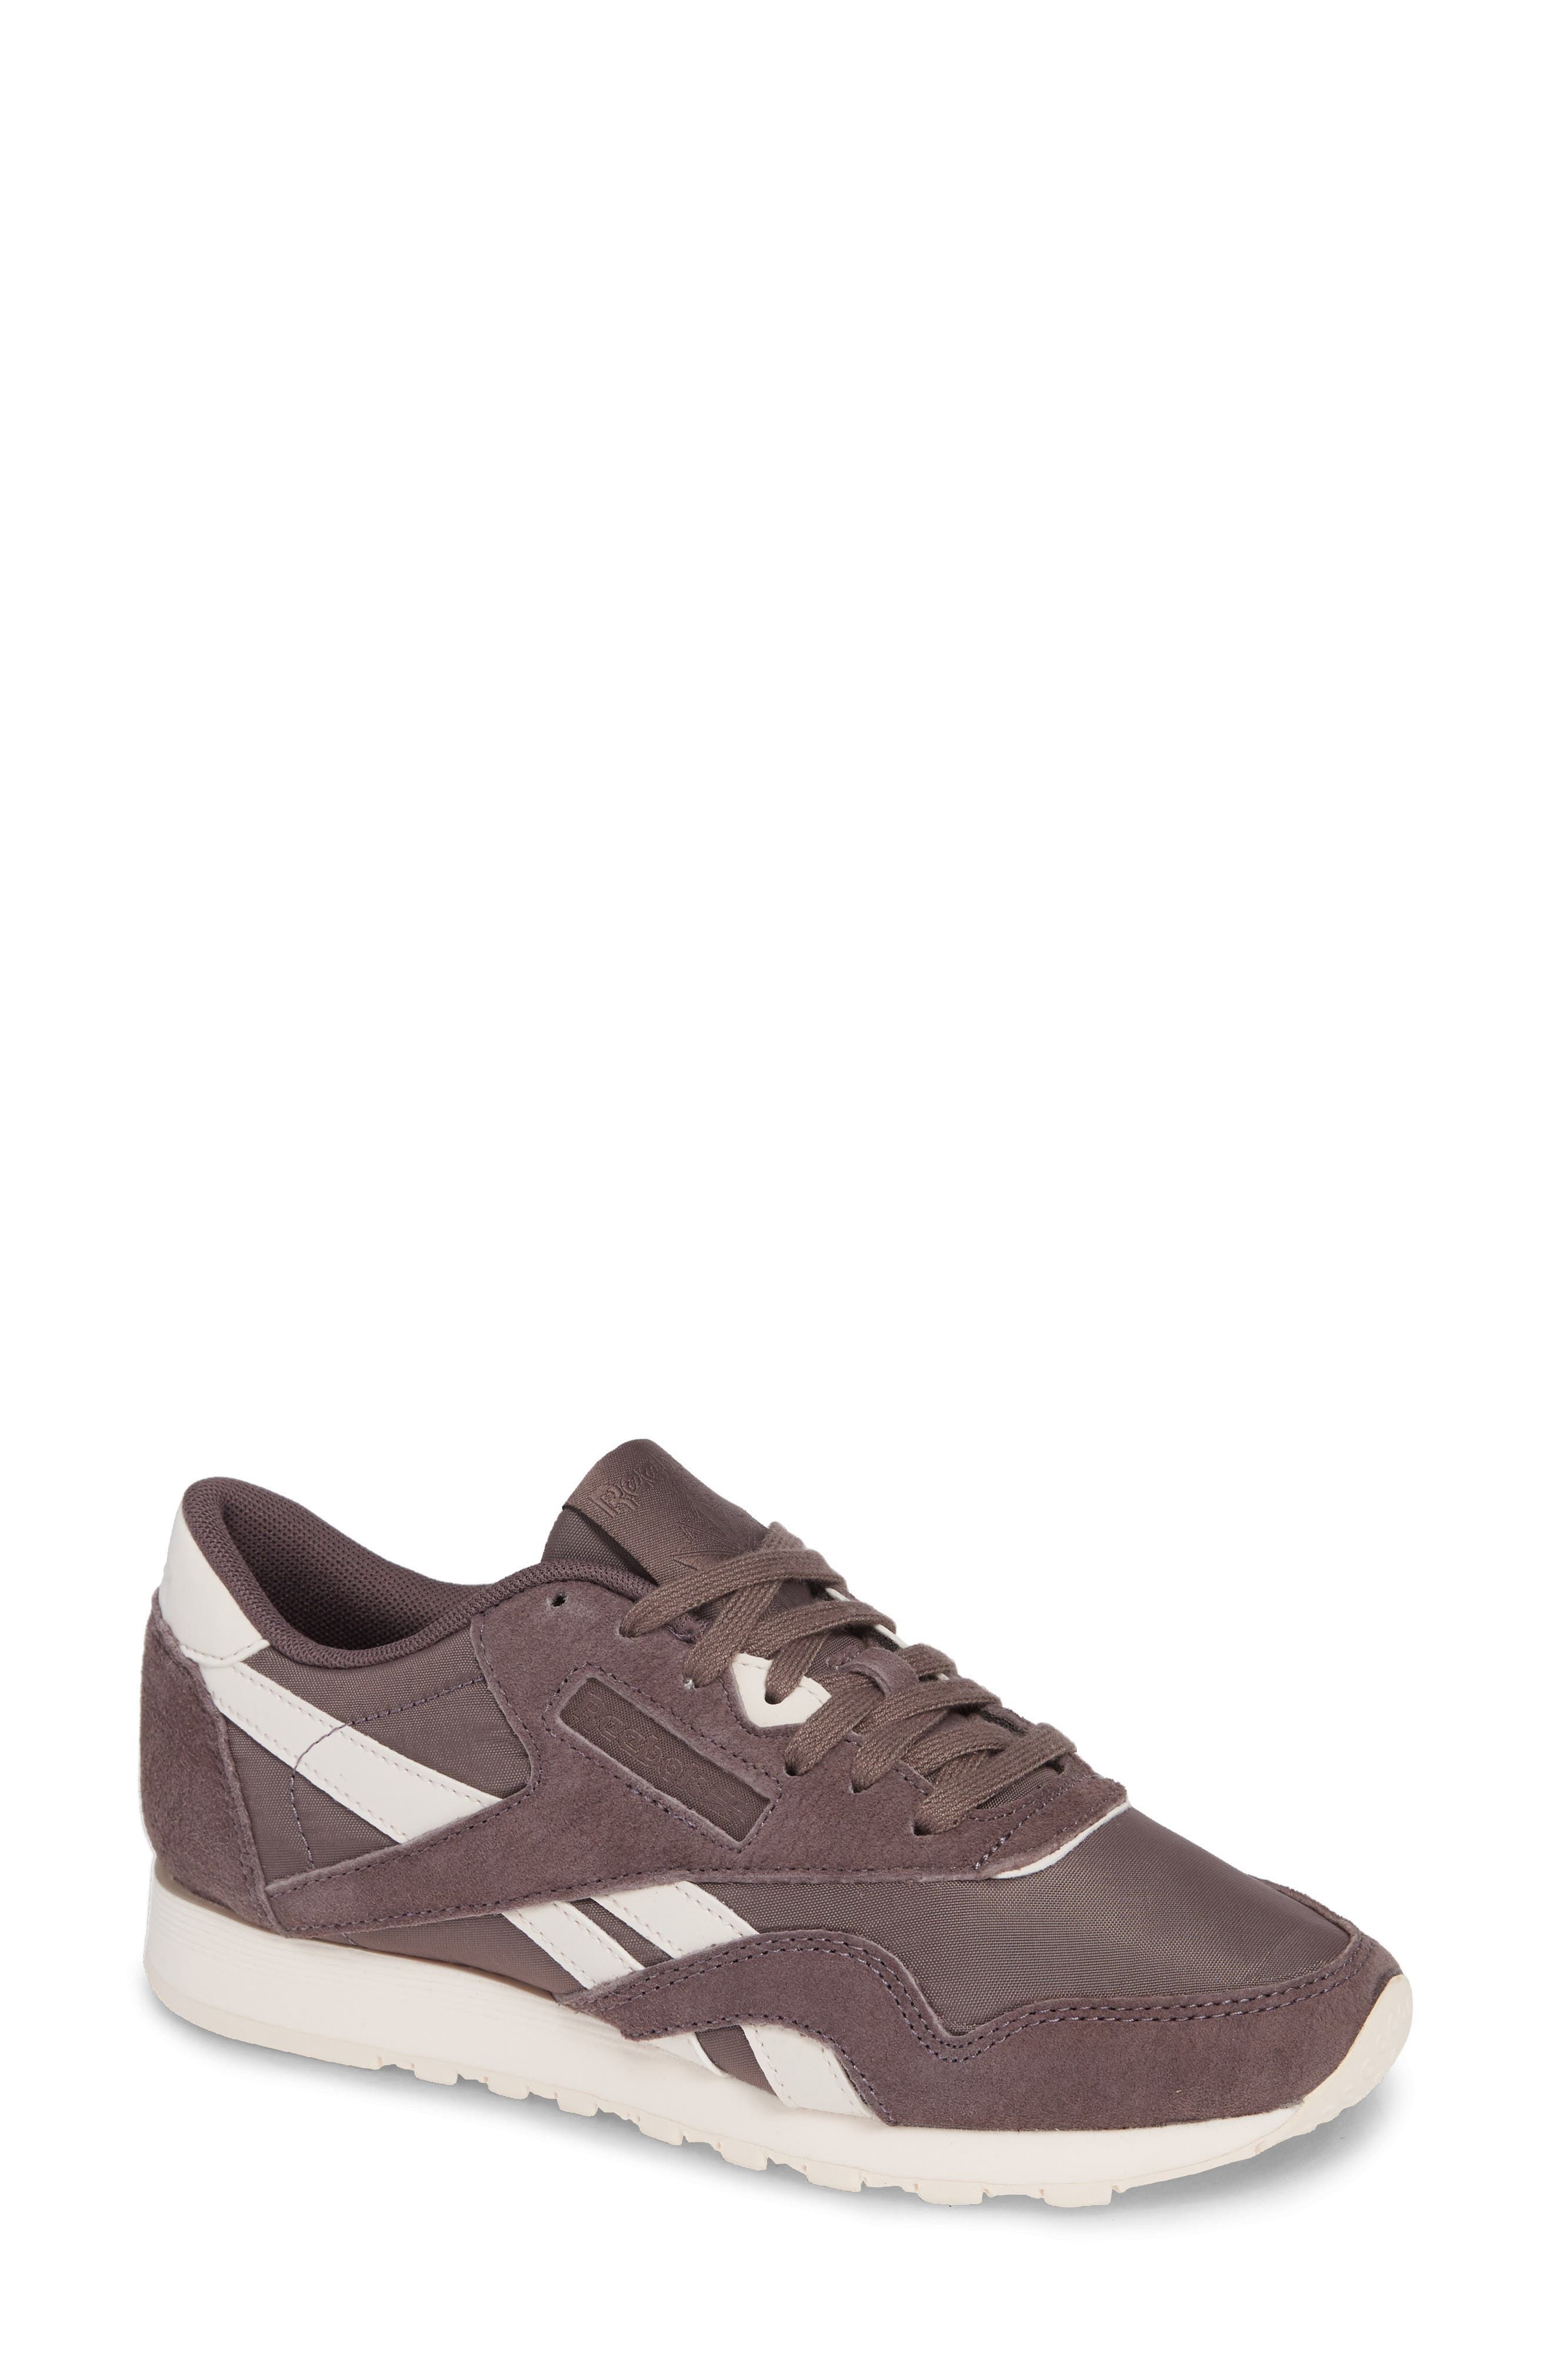 Classic Sneaker,                         Main,                         color, 020